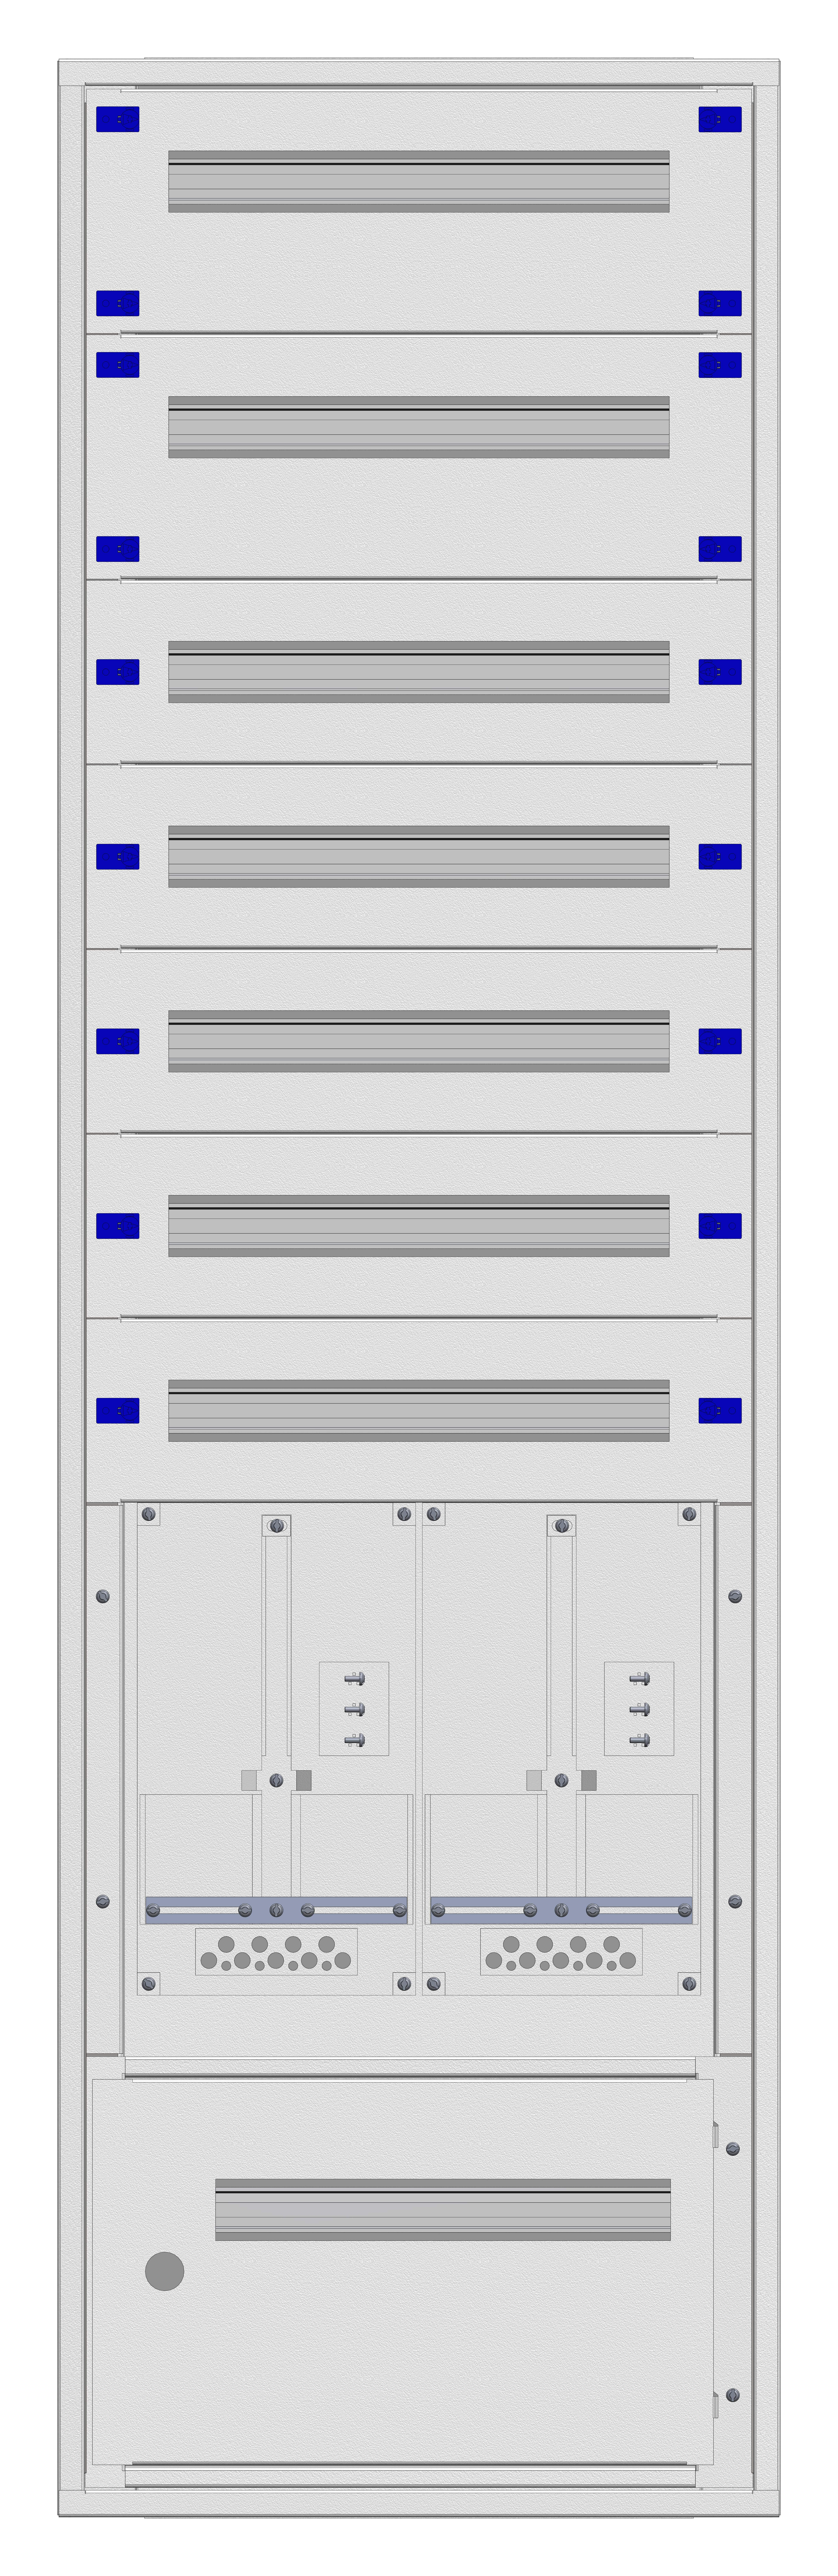 1 Stk Aufputz-Zählerverteiler 2A-39E/STMK 2ZP, H1885B590T250mm IL160239GS